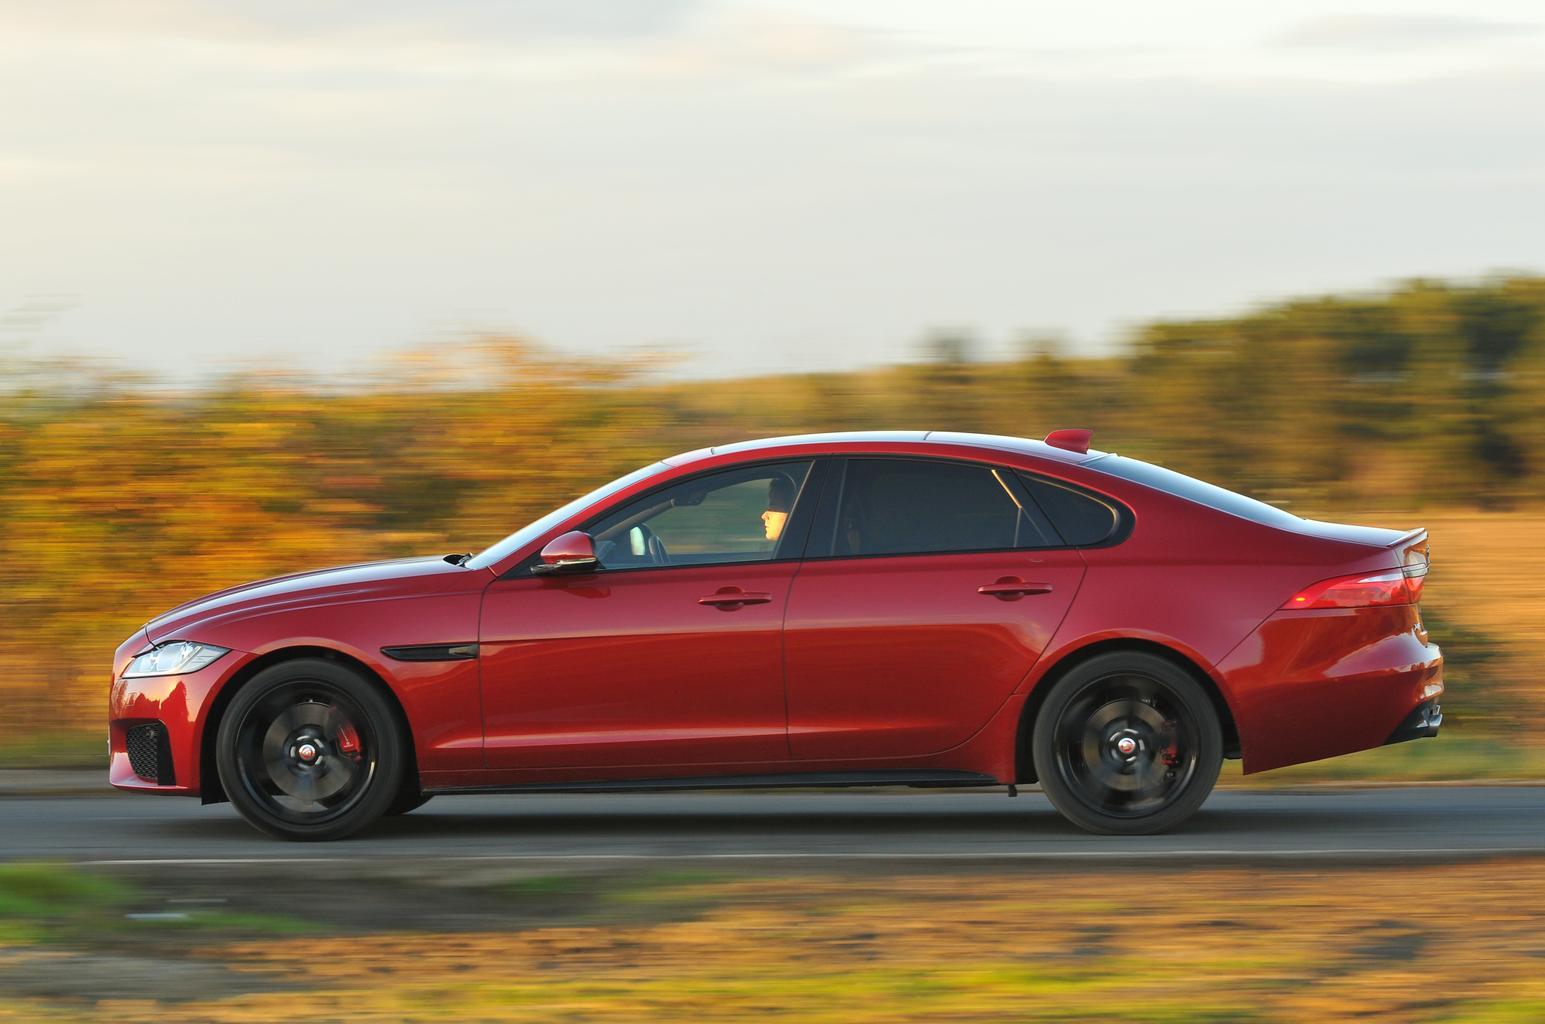 New BMW 5 Series vs Jaguar XF